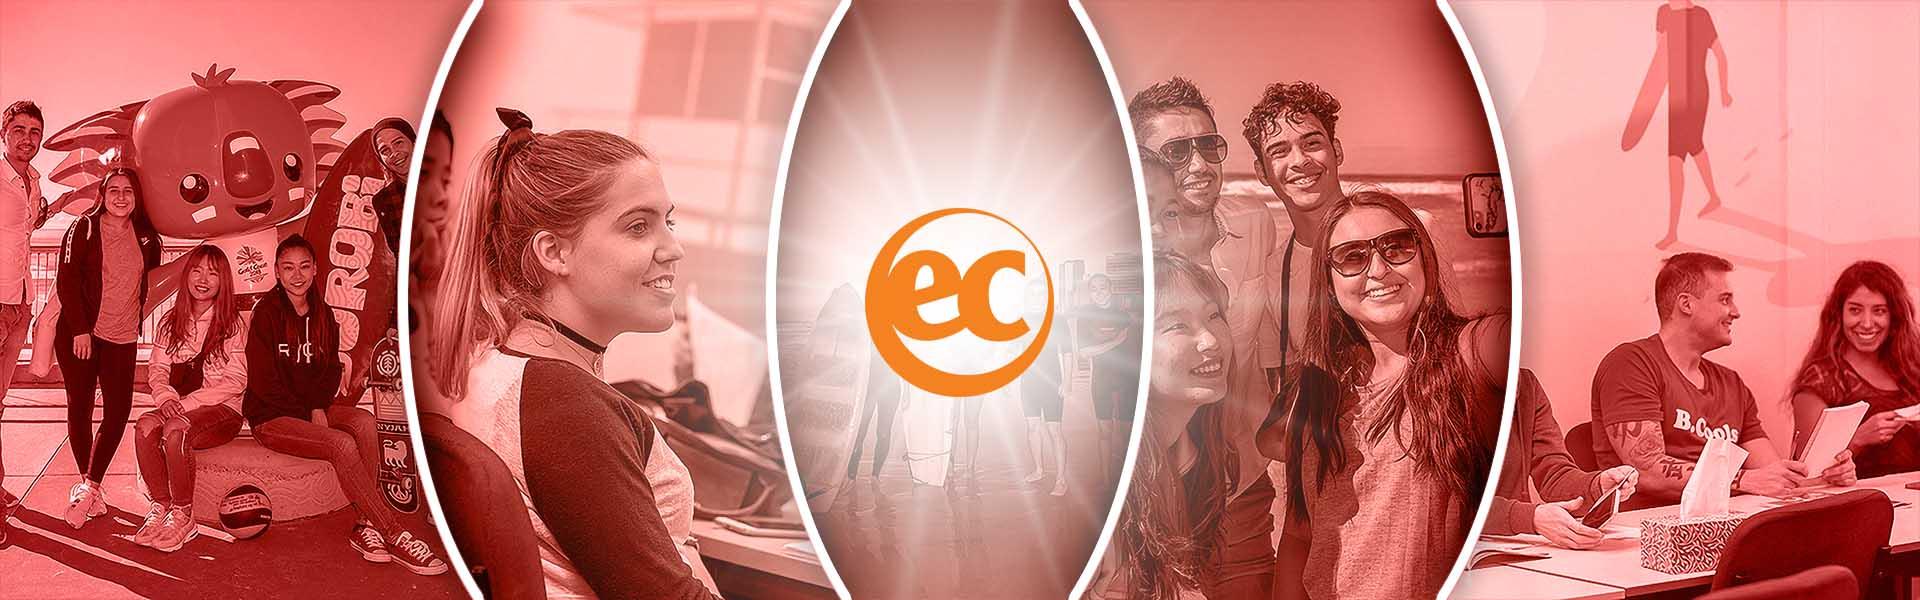 EC English Gold Coast Dil Okulu